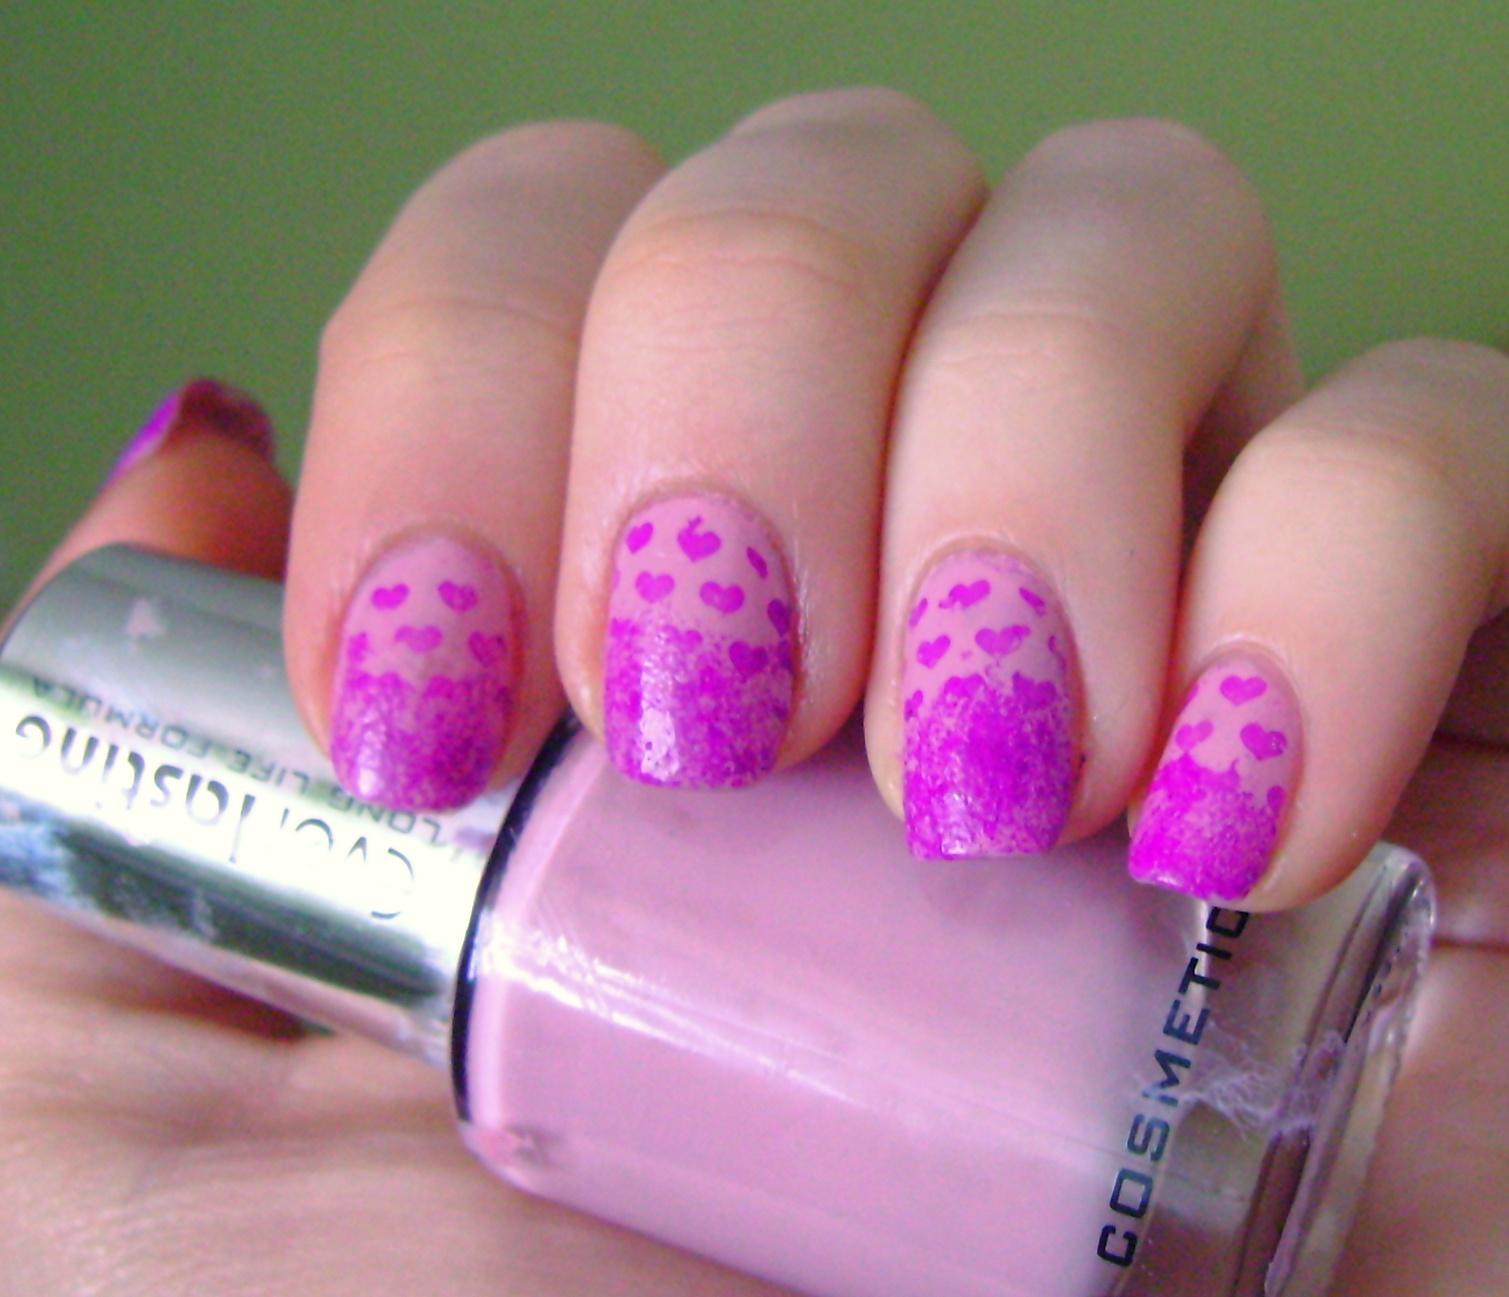 acrylic nail art designs: Valentine's Day manicure